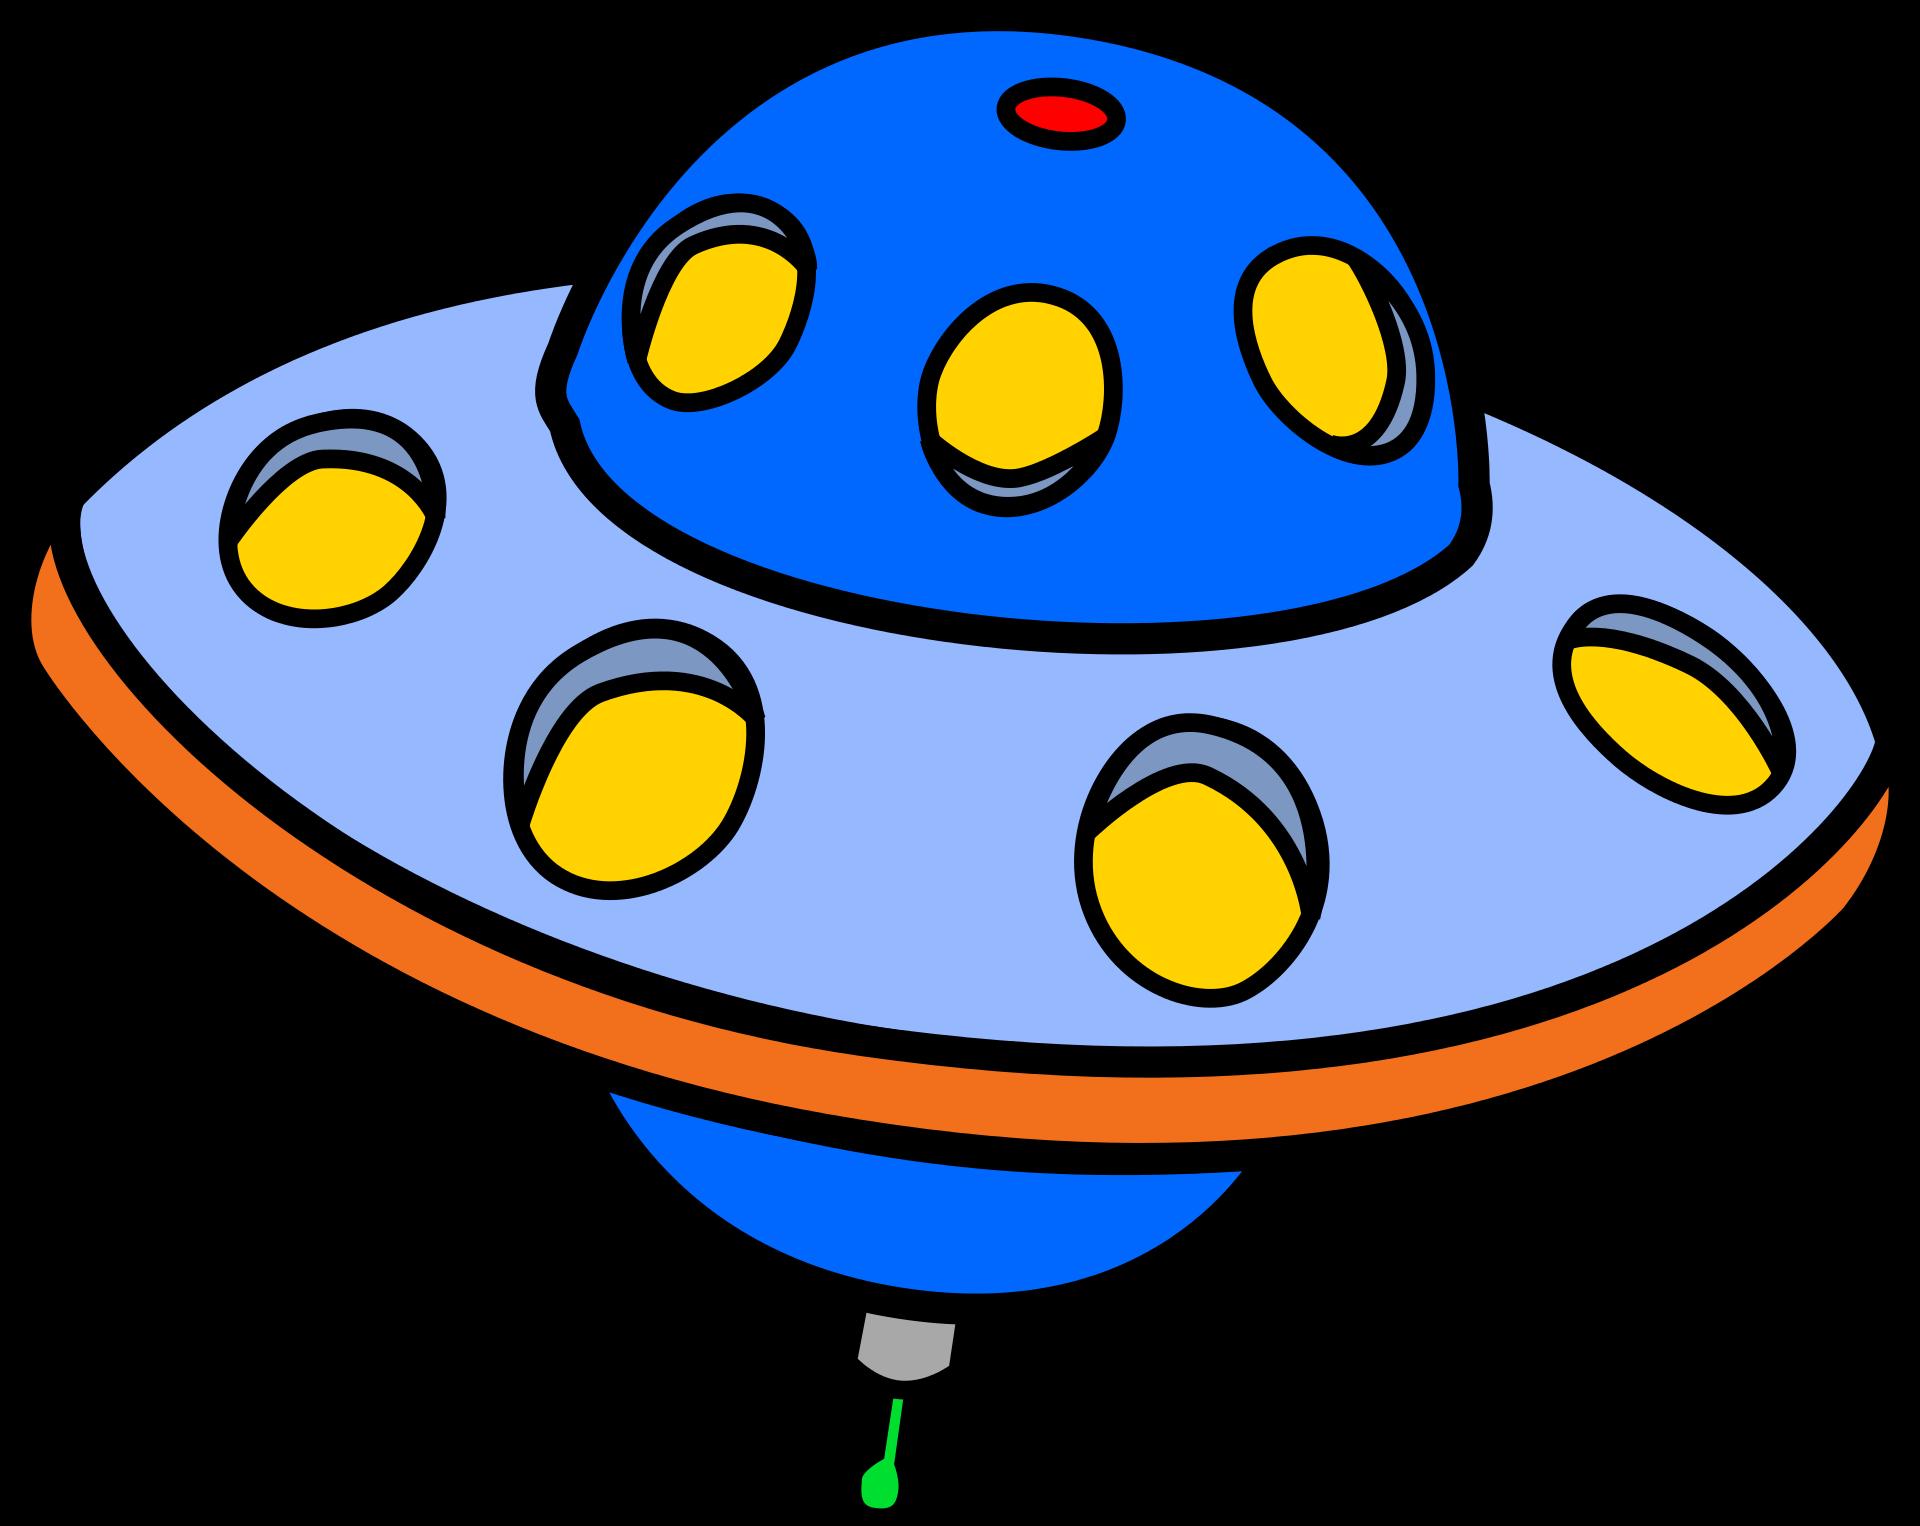 alien spacecraft clipart - HD1920×1526